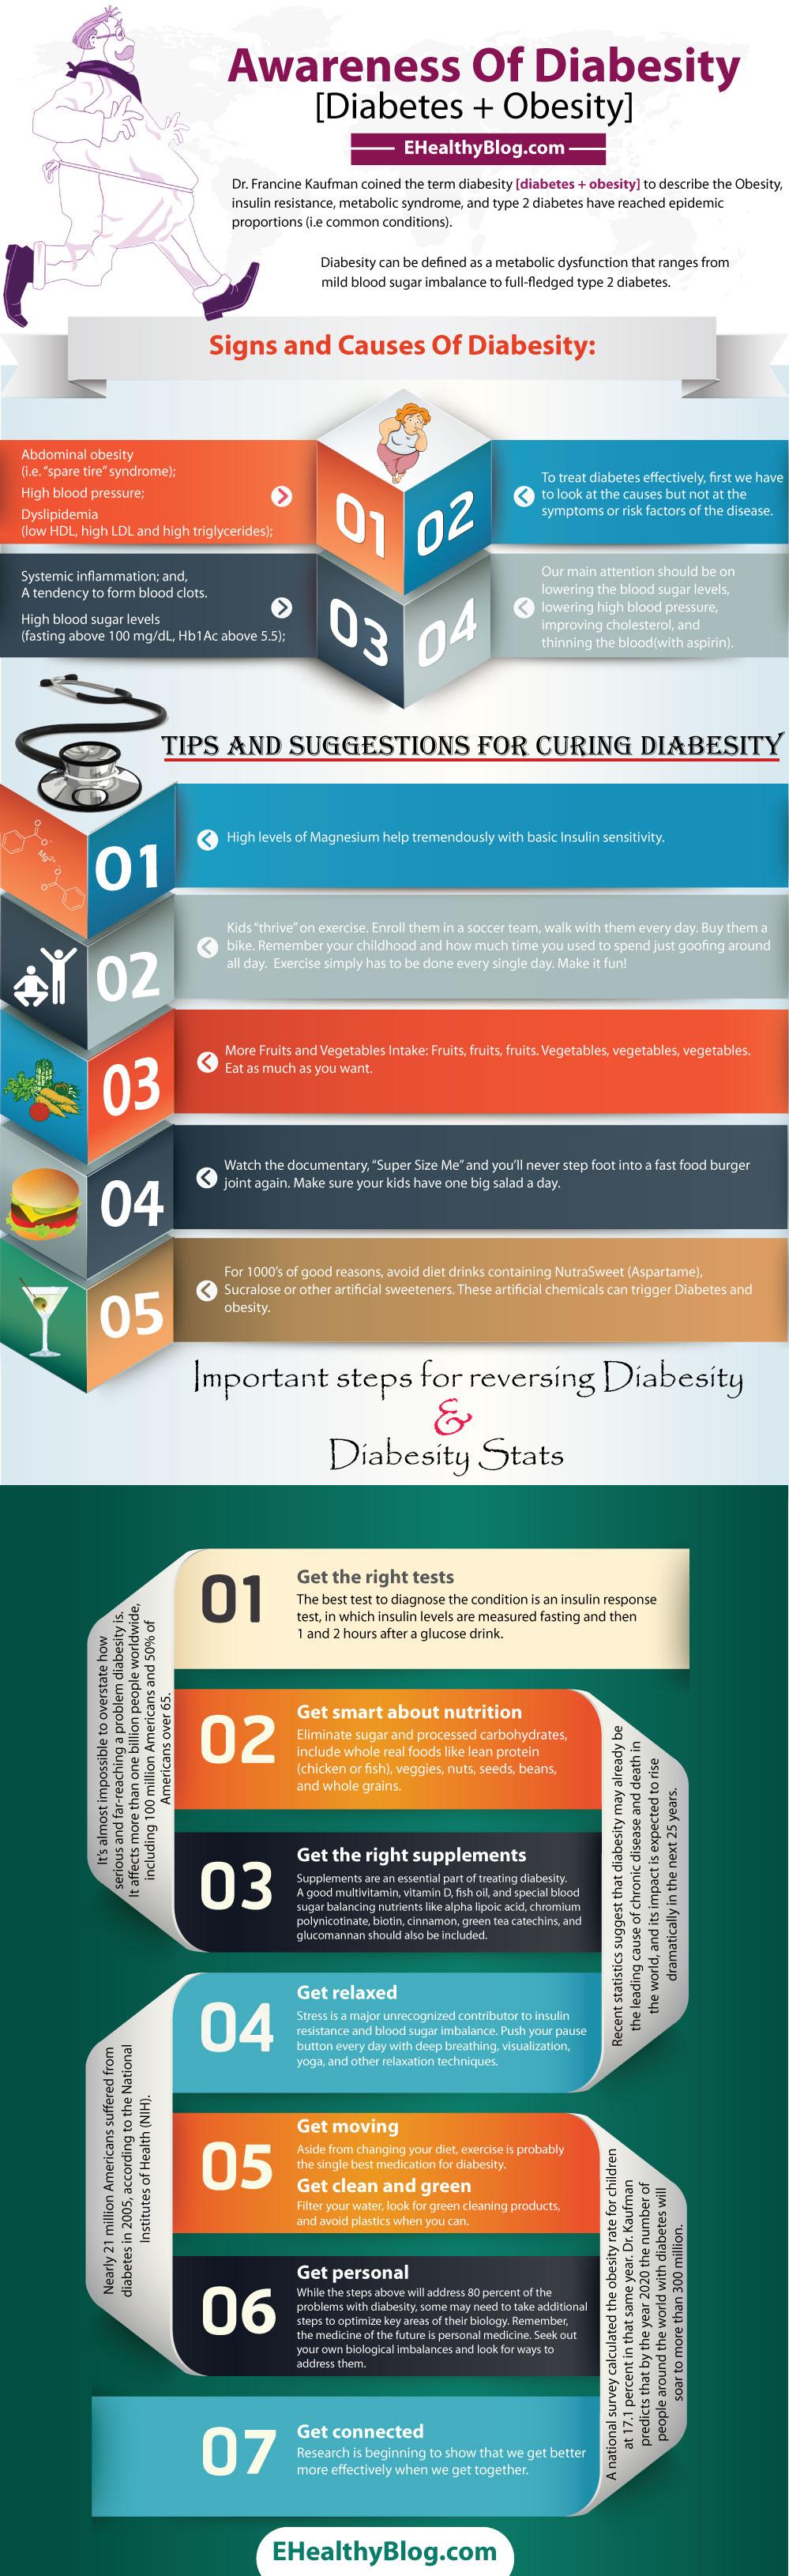 Relating Obesity to Diabetes